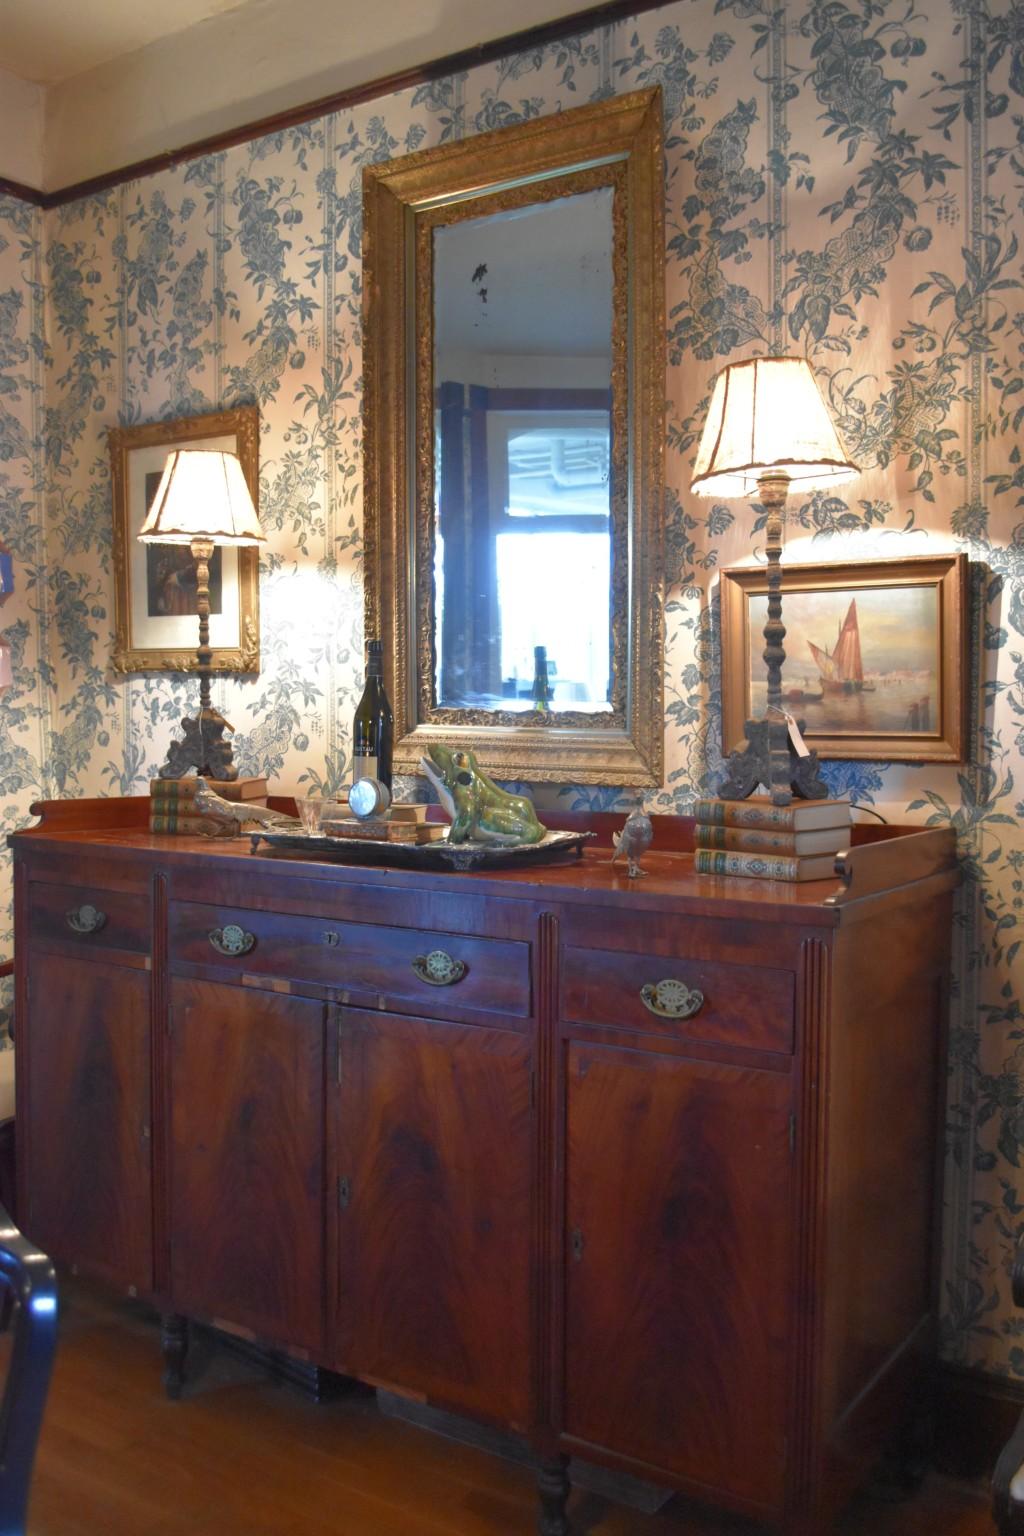 sheraton sideboard, dining room